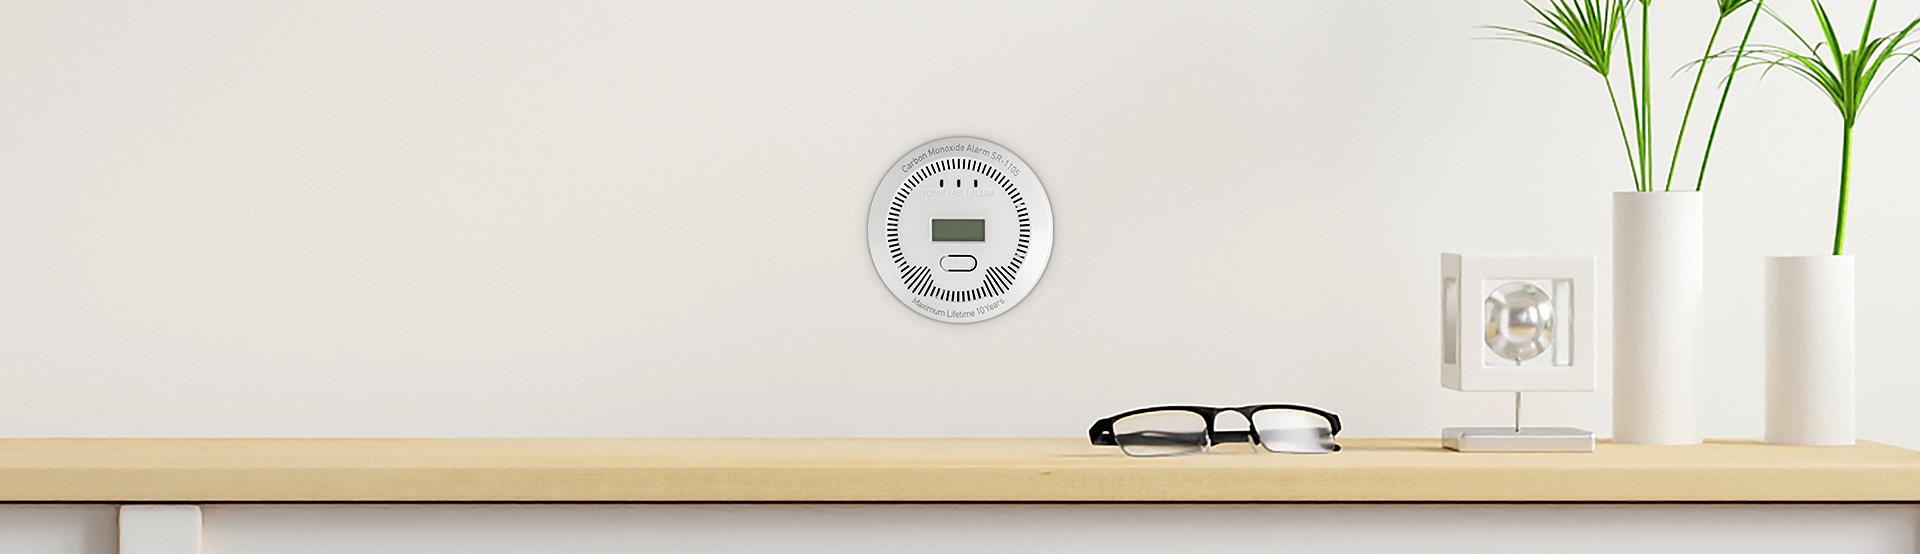 co (carbon monoxide) detector lanberg indoor +bulit-in thermometer 4